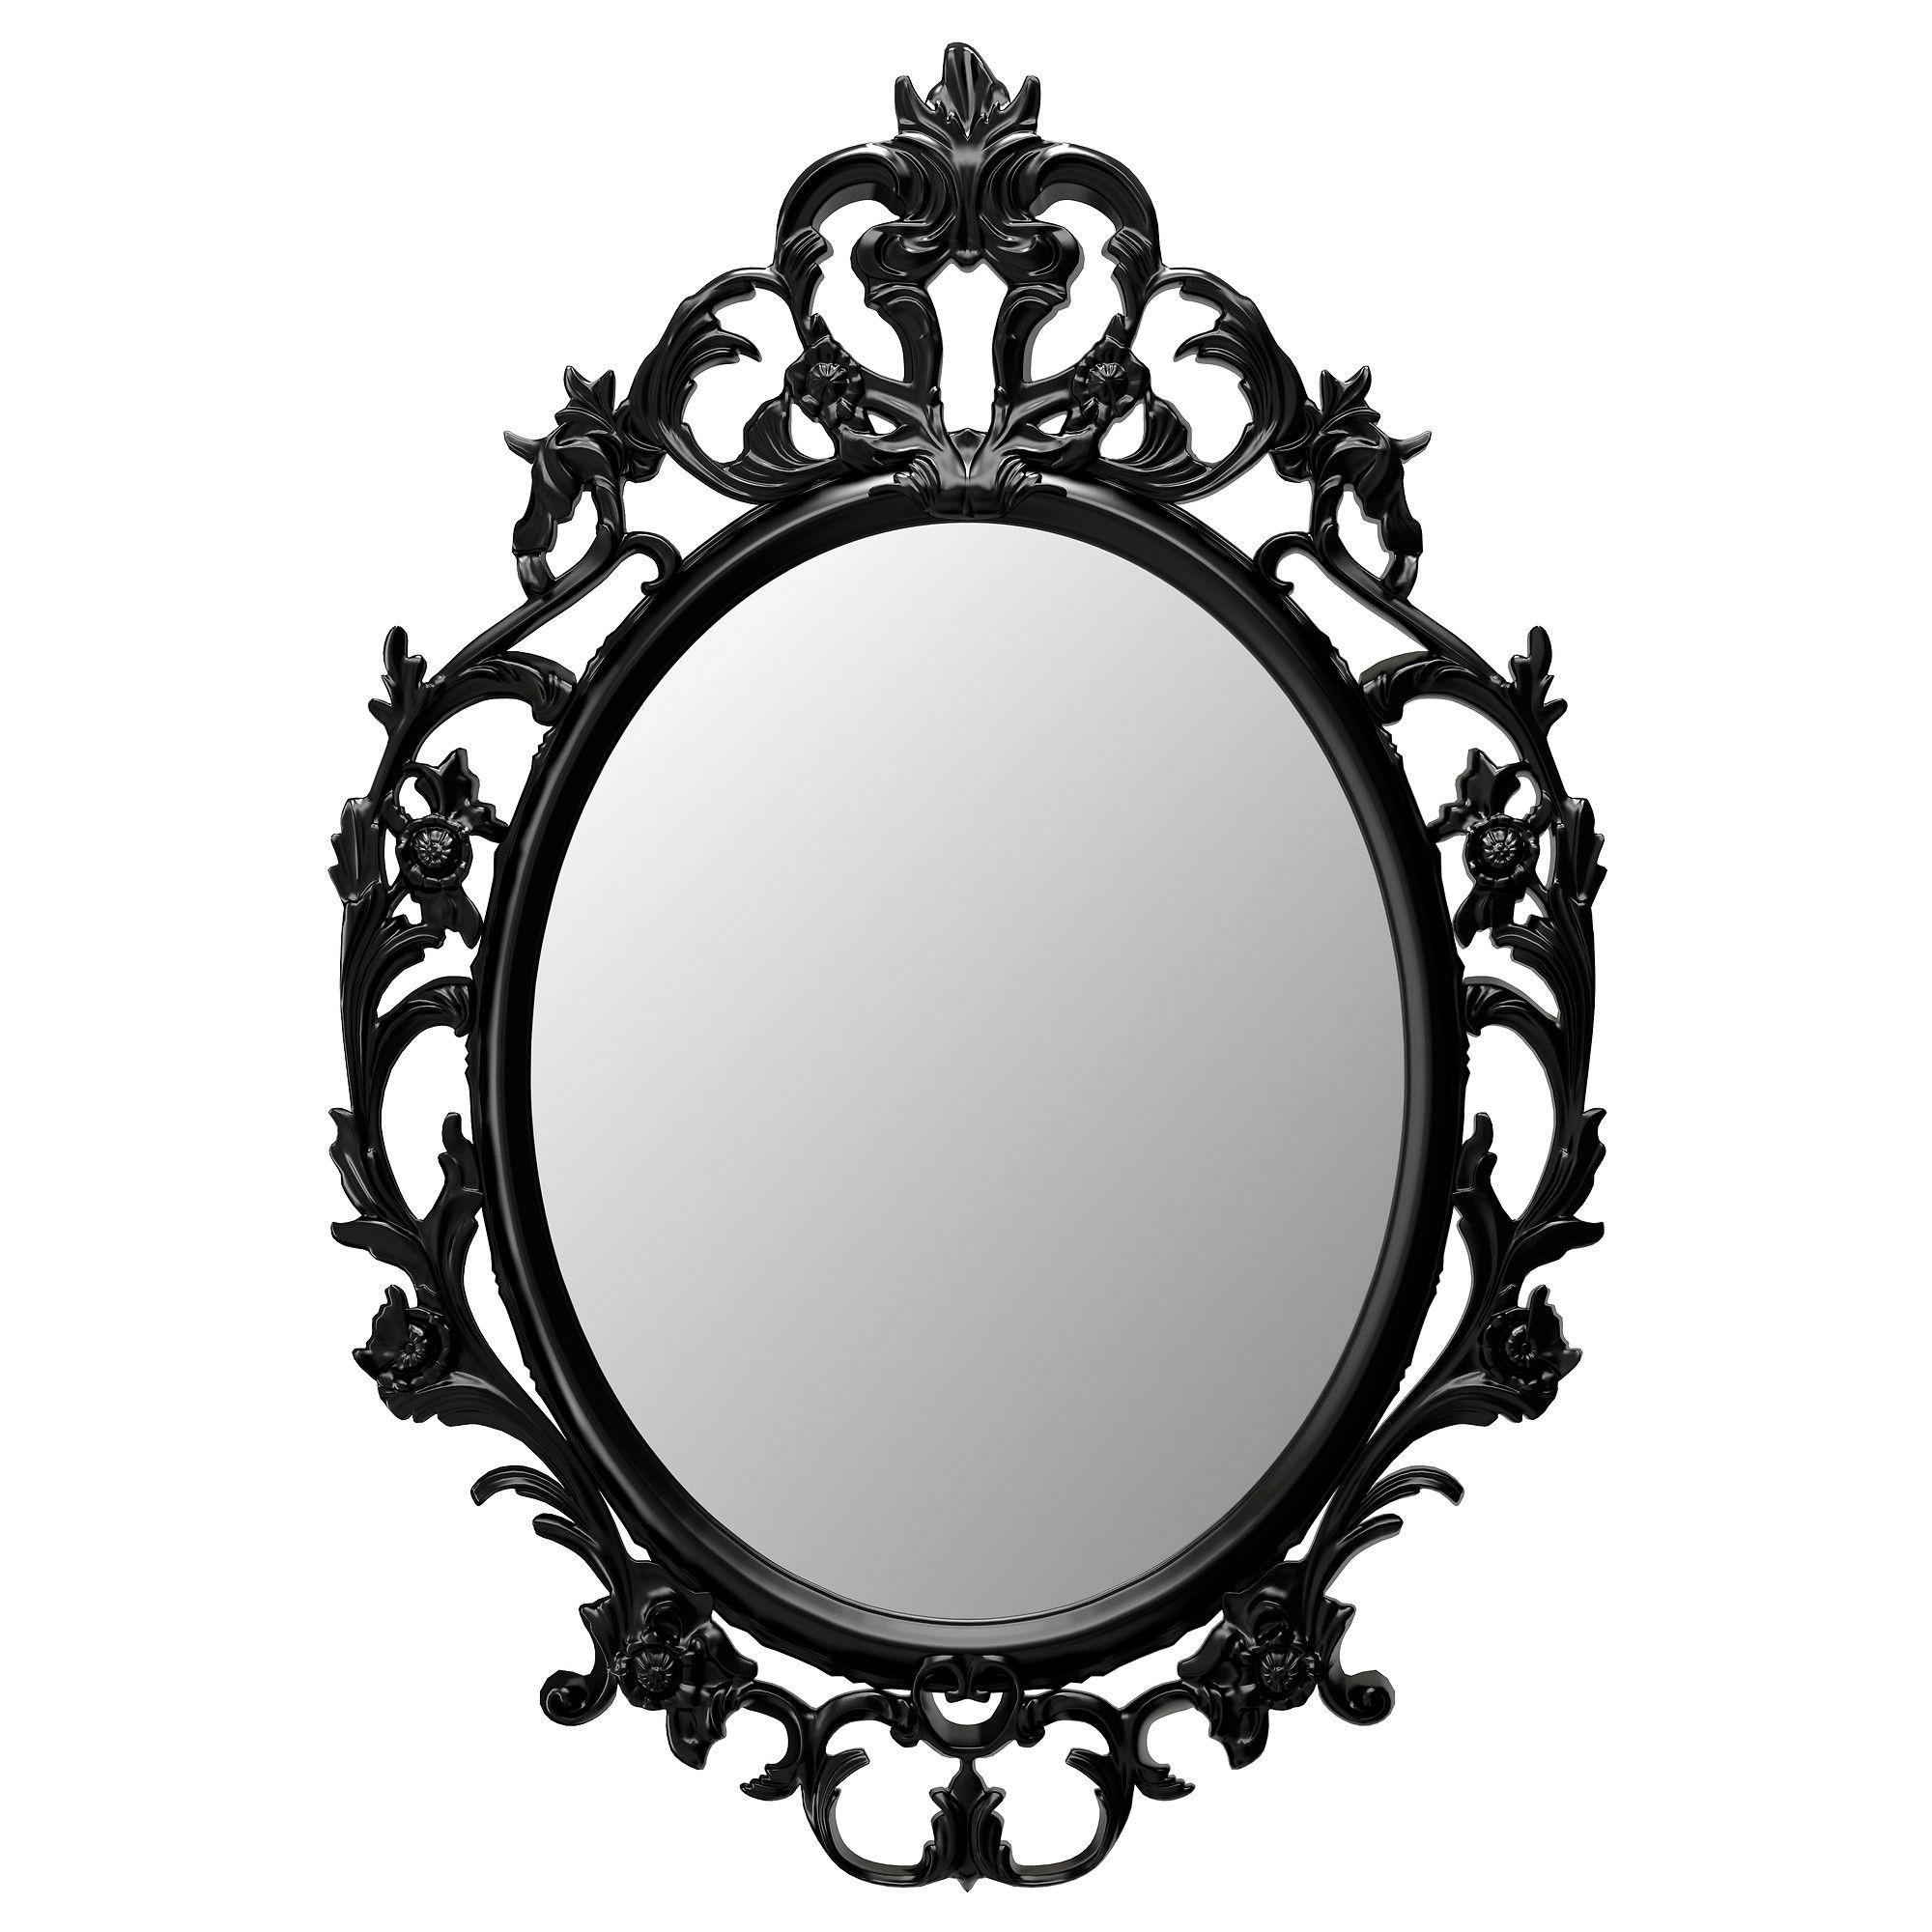 UNG DRILL Miroir Ovale Noir SALLE DE BAINS Pinterest